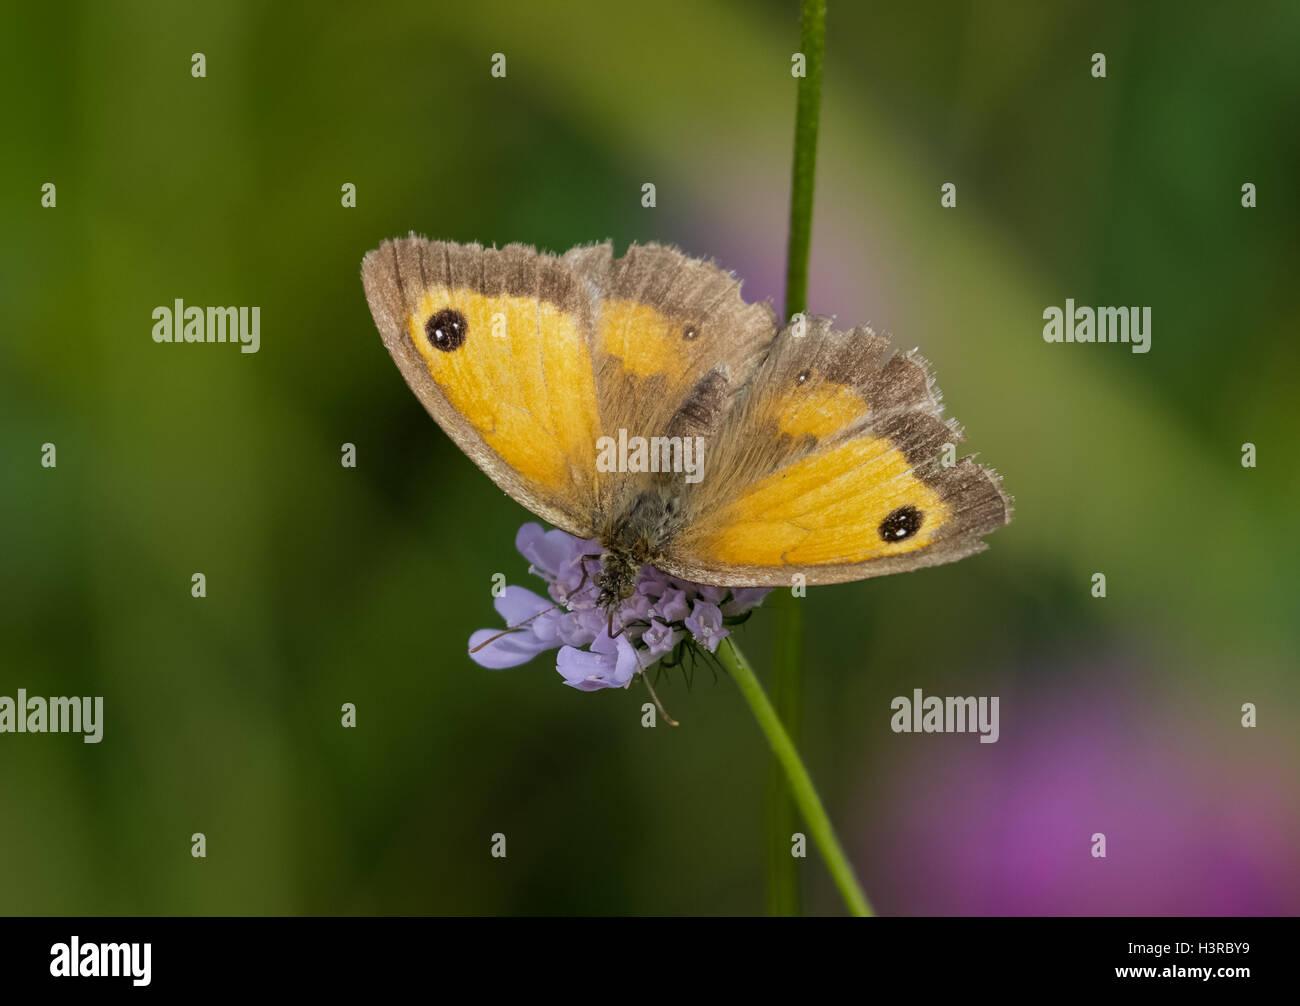 Female Gatekeeper butterfly (Pyronia tithonus) on scabious flower - Stock Image